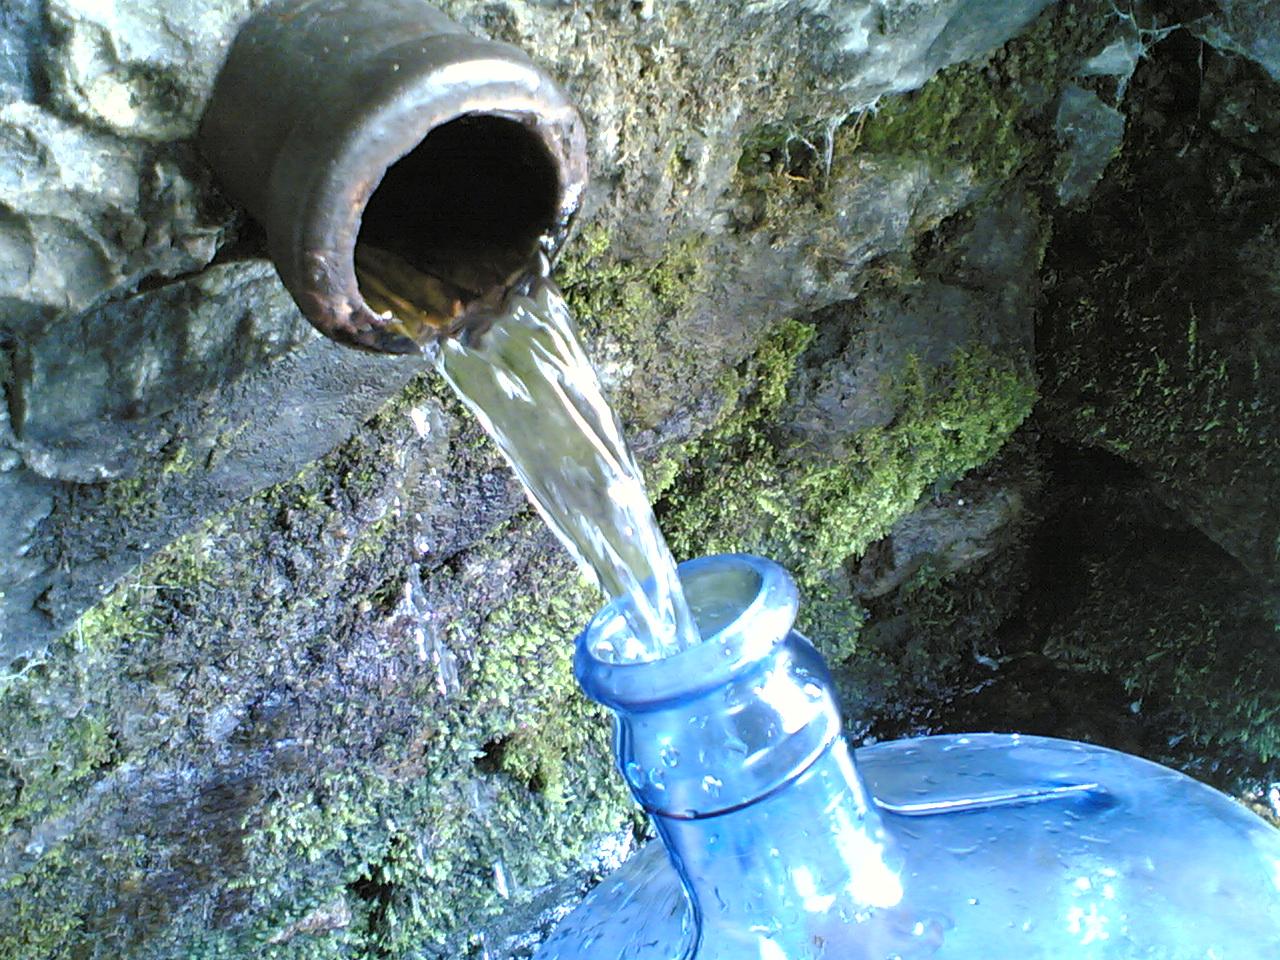 Lunedì senz'acqua per mezza Catania$